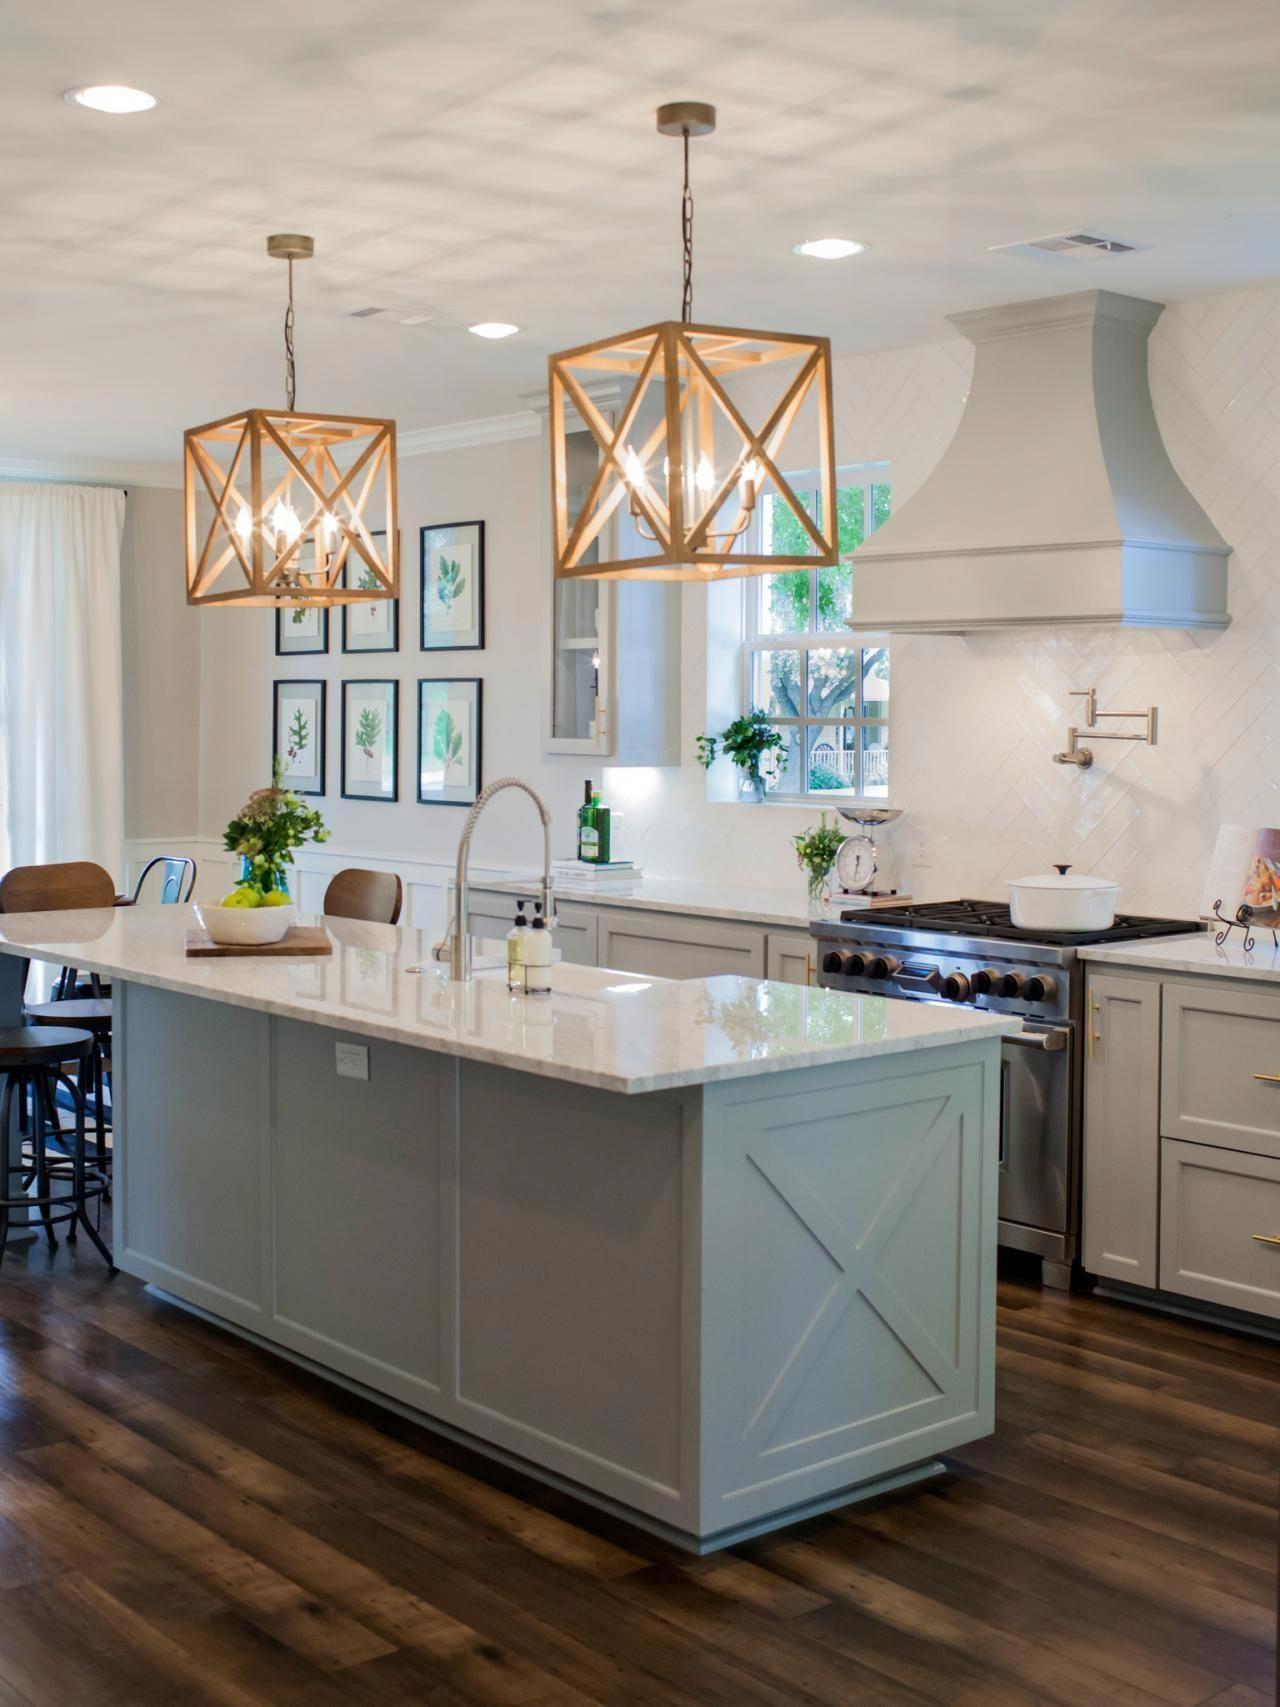 10+ Enthralling 8x8 Kitchen Remodel tricks Ideas in 2020 ...